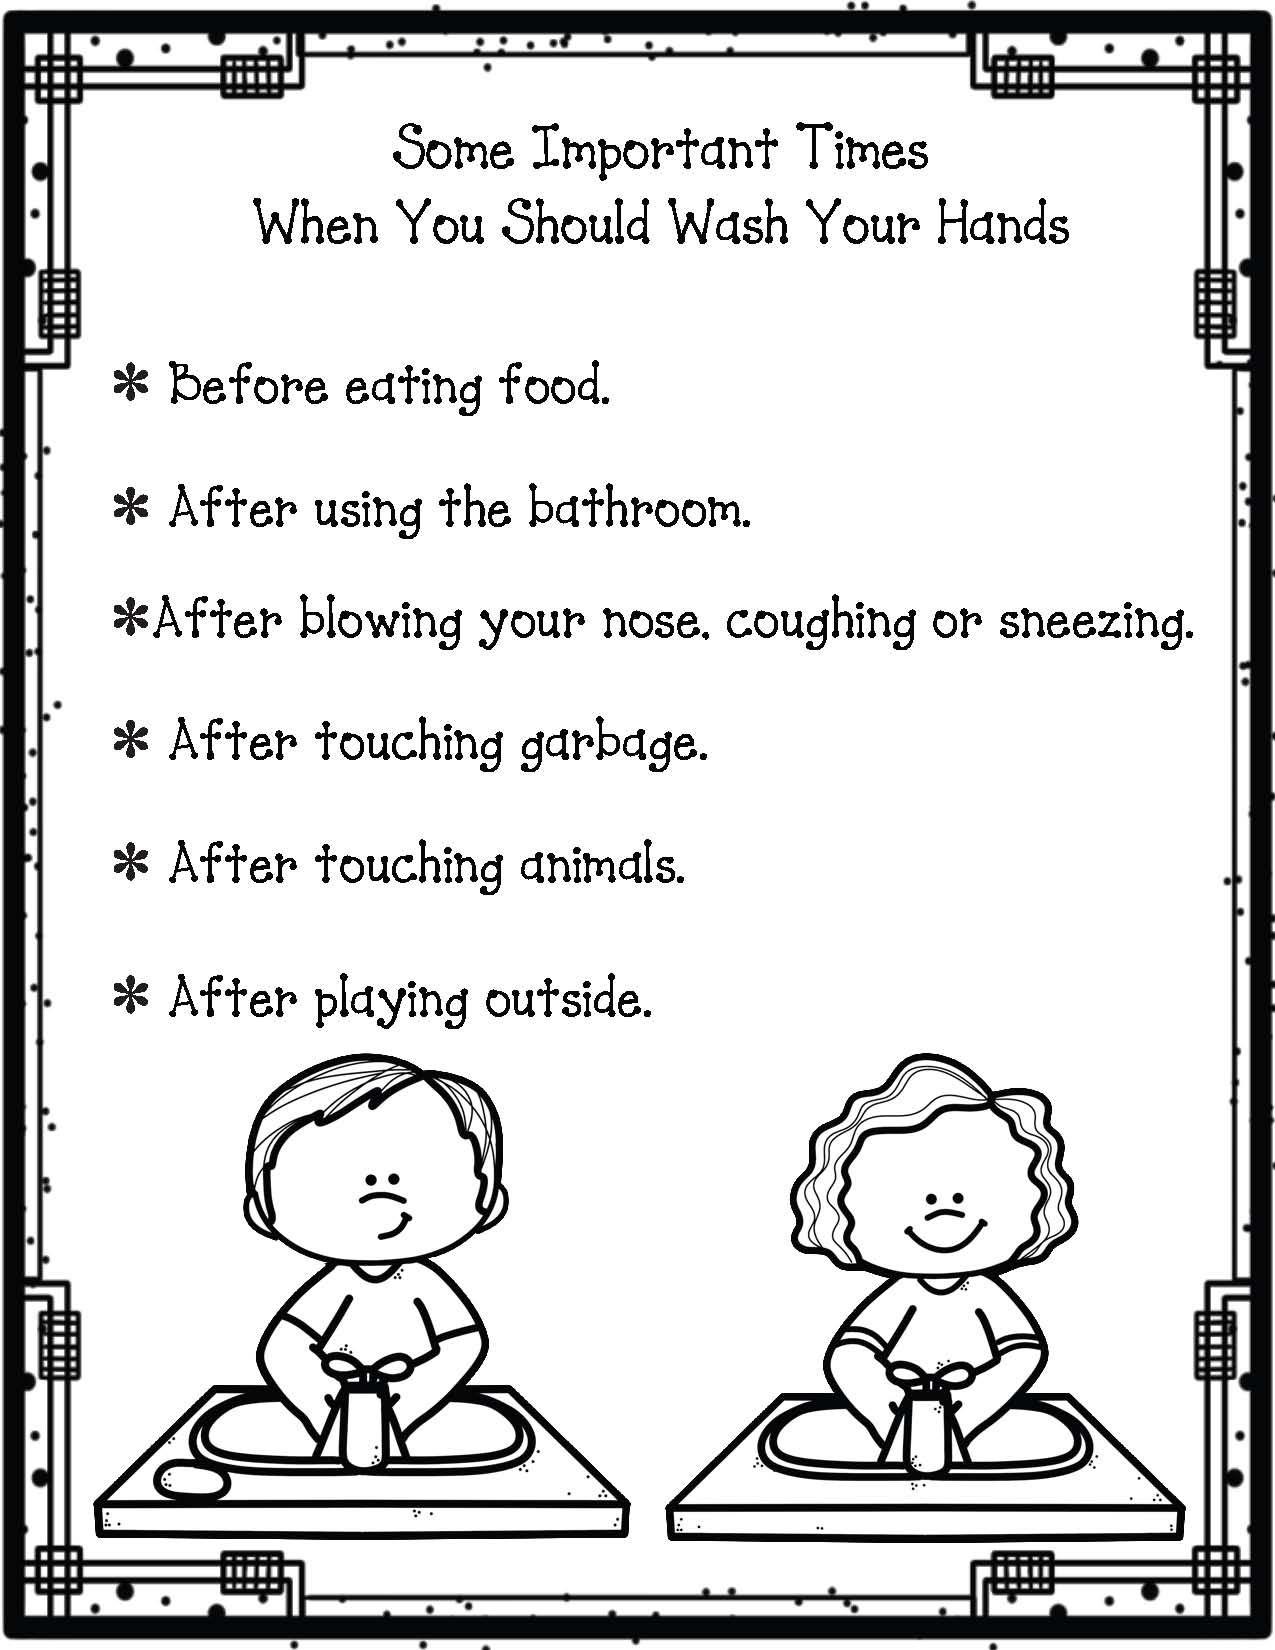 Free Color Me Hand Washing Poster Kindergarten Worksheets Handwriting Worksheets For Kindergarten Kindergarten Worksheets Free Printables [ 1650 x 1275 Pixel ]